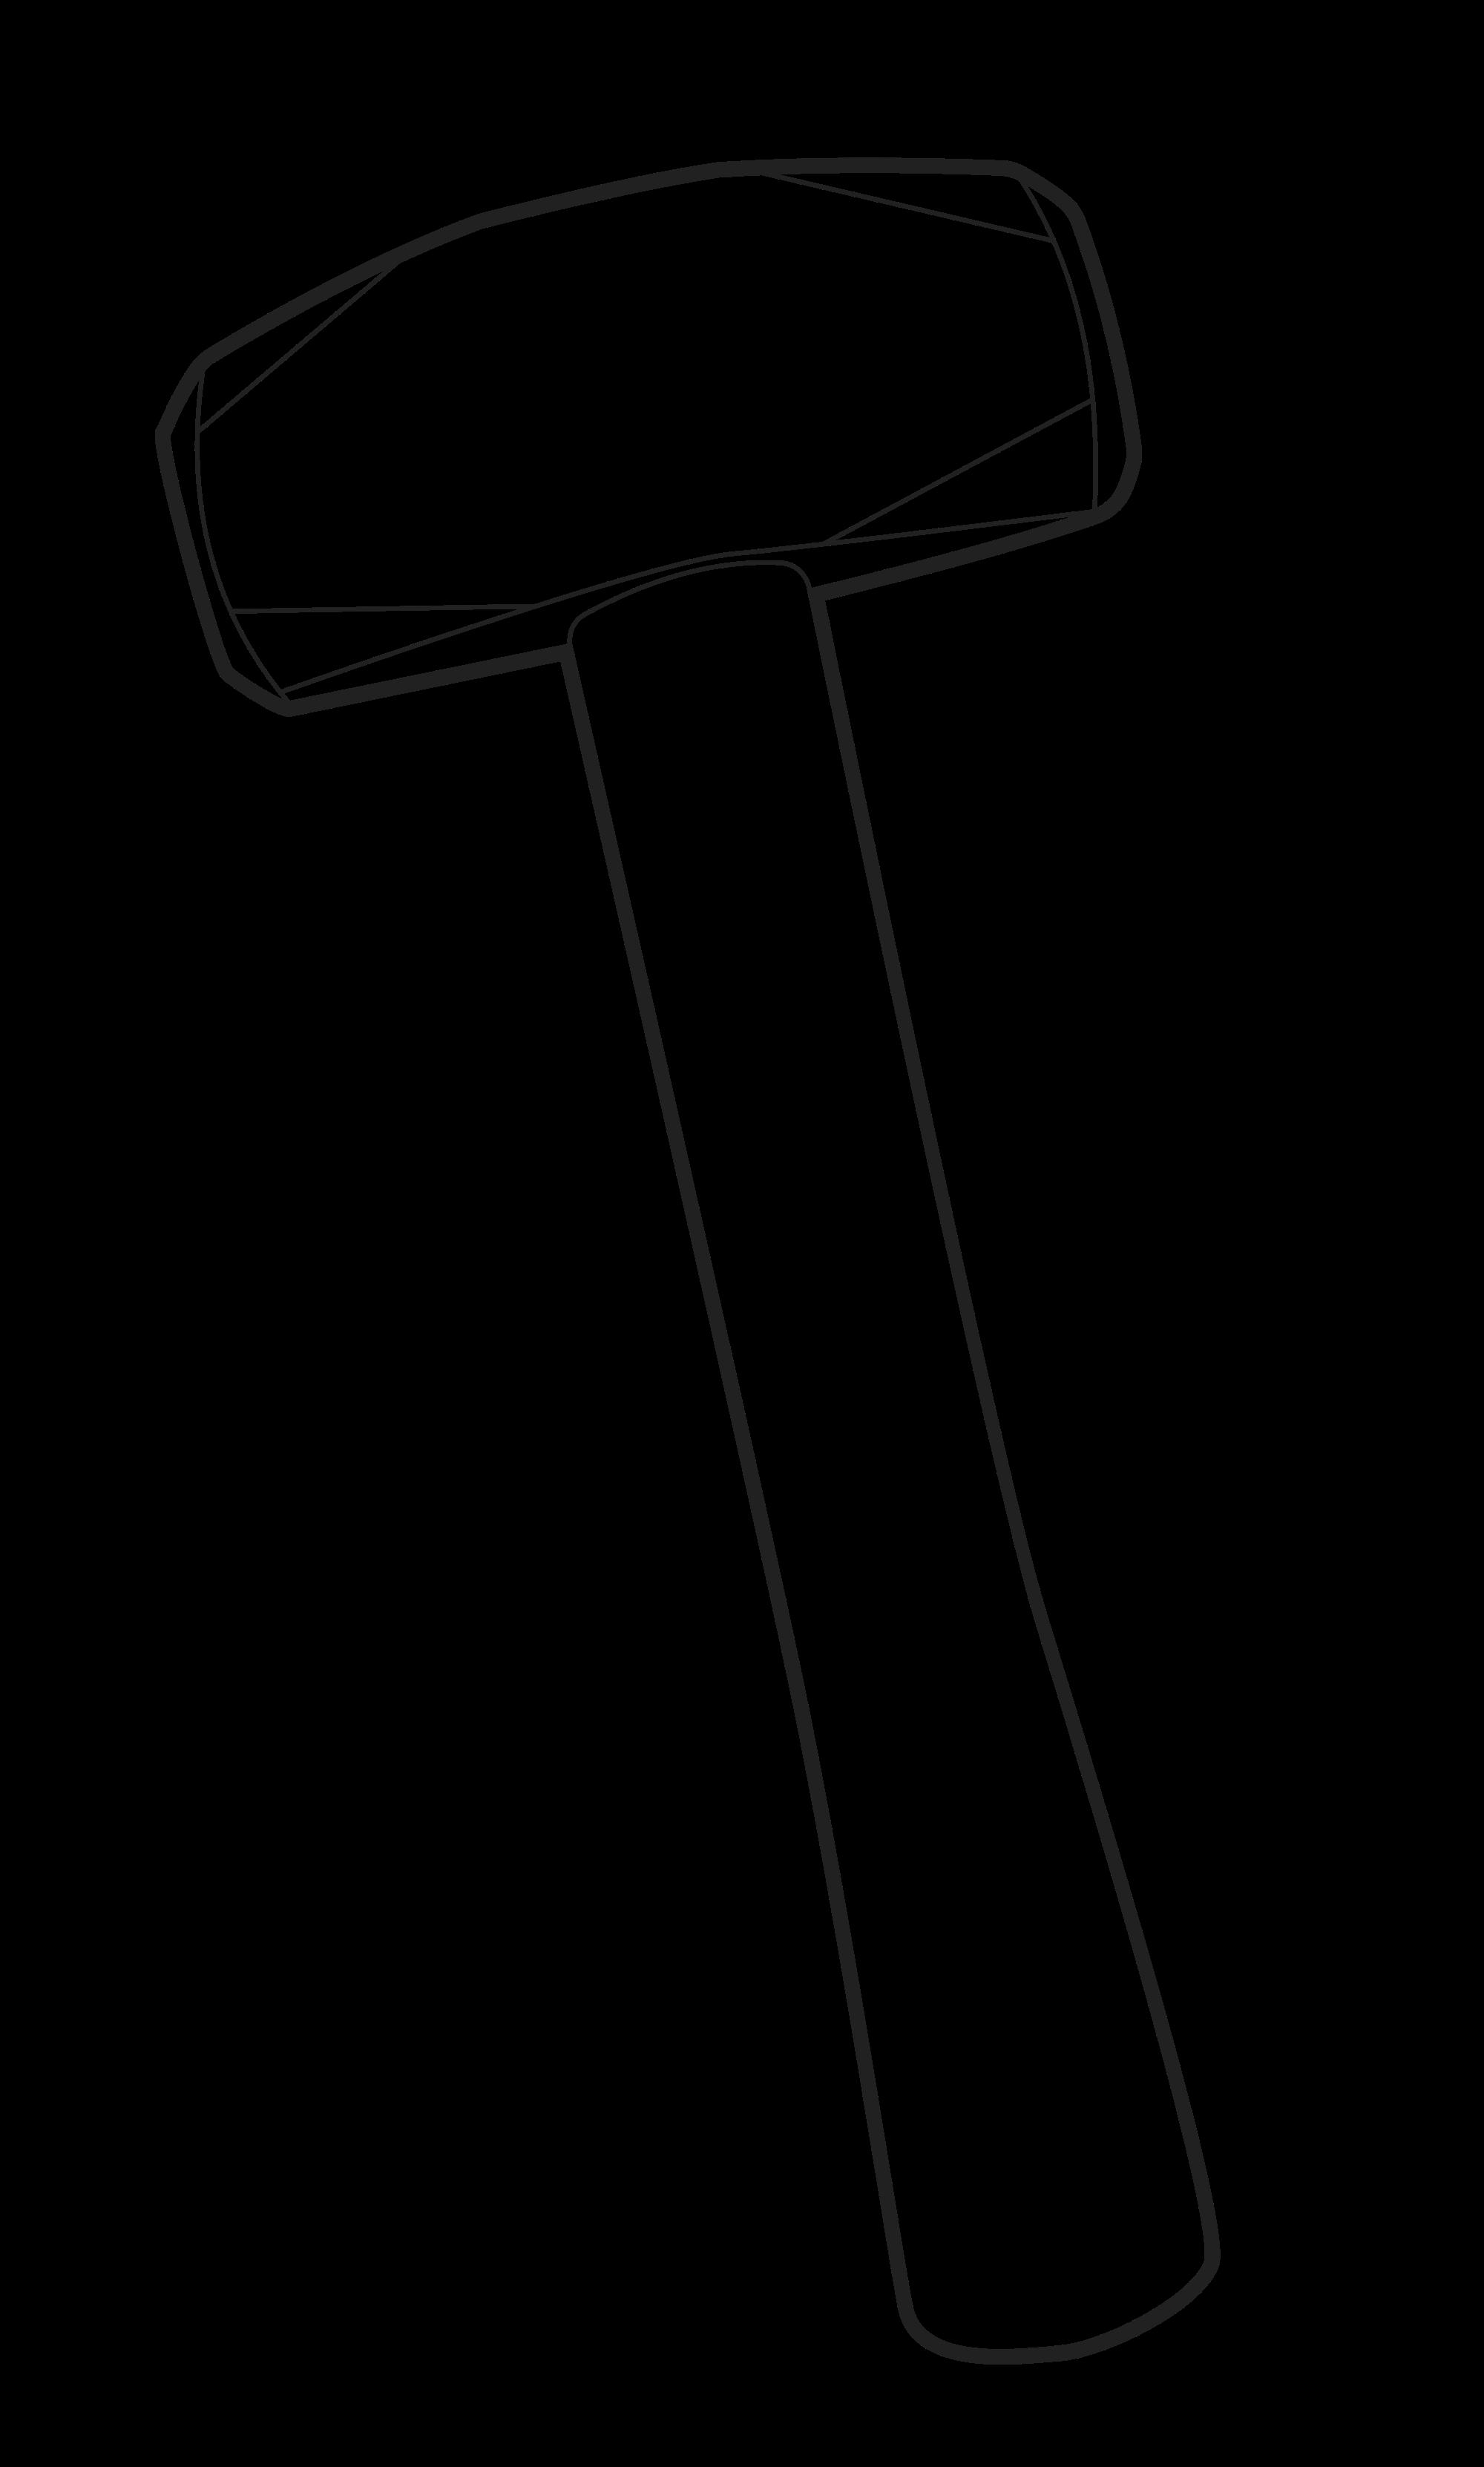 Hammer clipart sketch. Drawing at getdrawings com